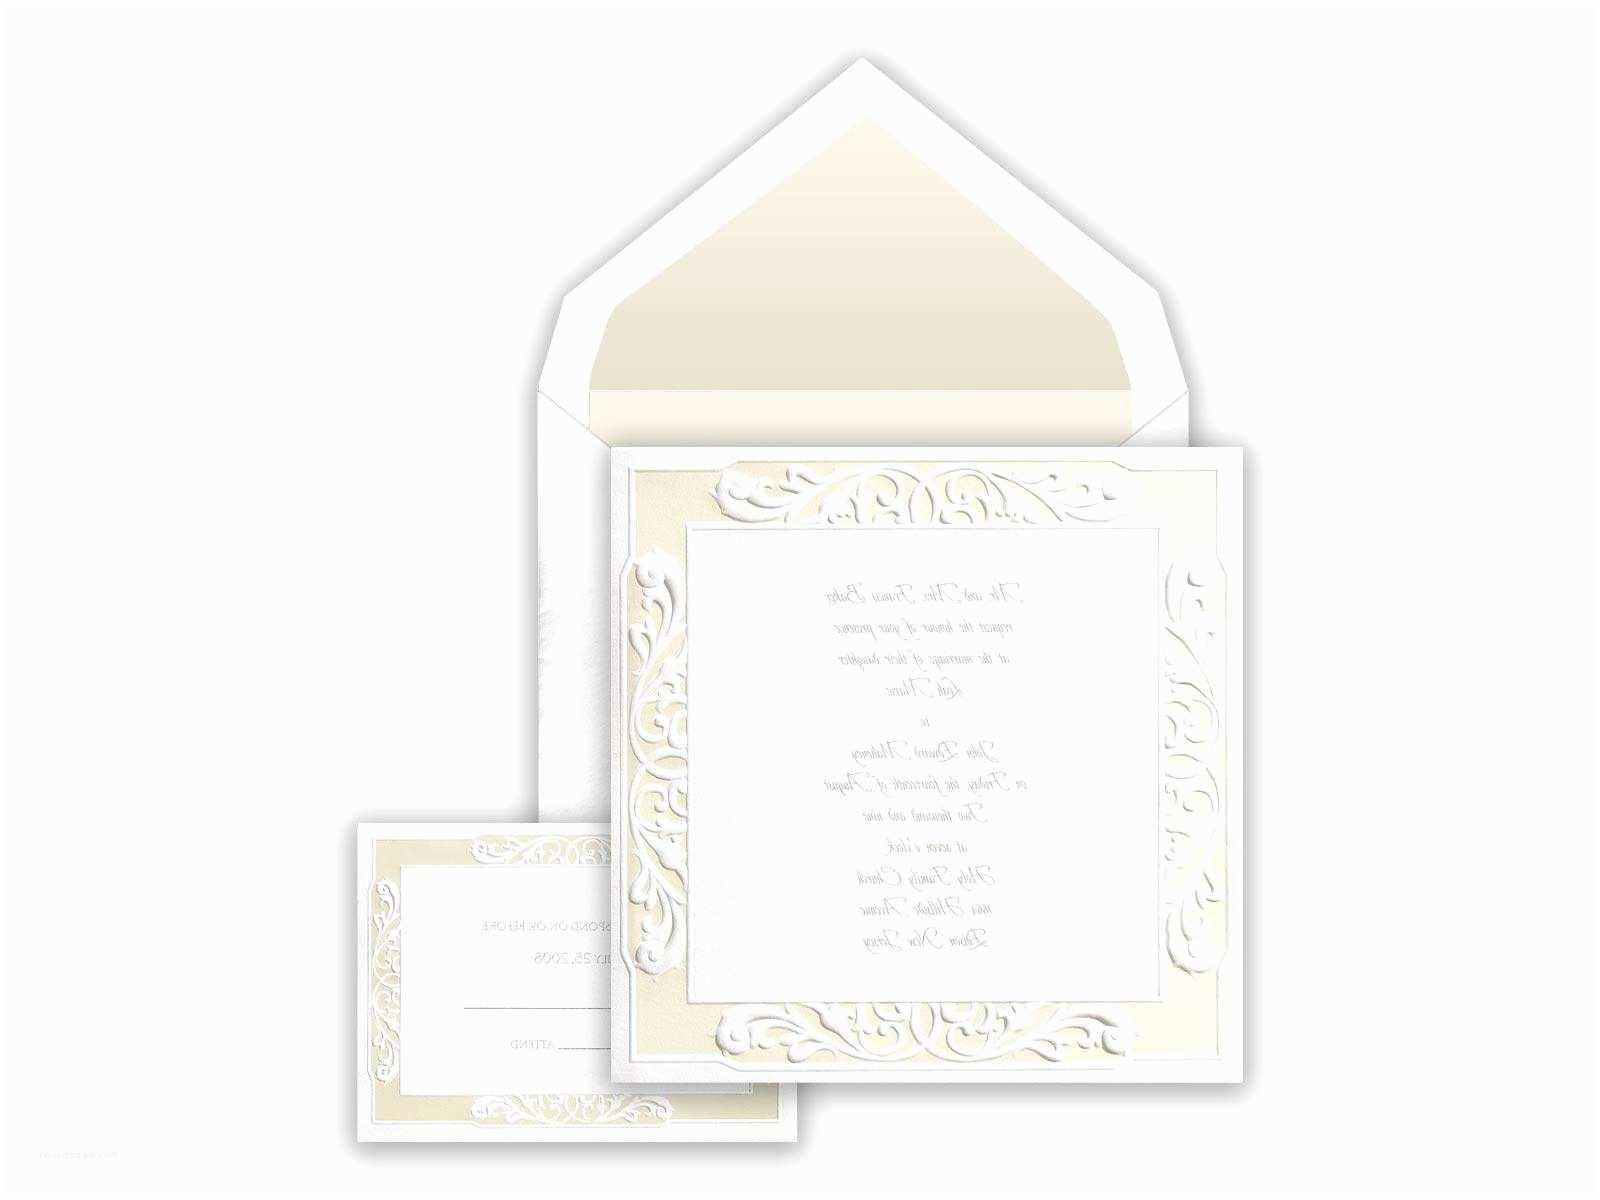 Lds Wedding Invitation Wording Tanya S Blog Wedding Decoration 40 Tissue Paper Flower